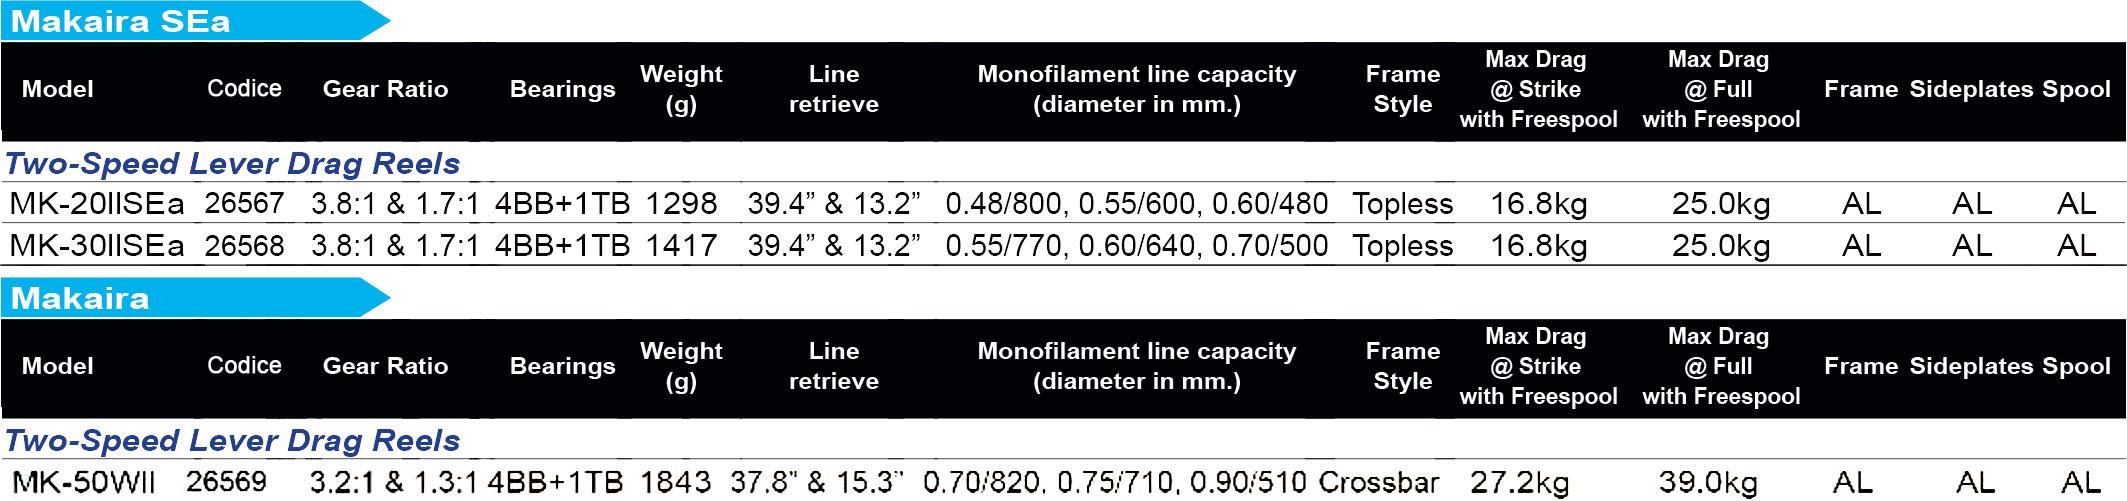 fishing reels makaira okuma technical data